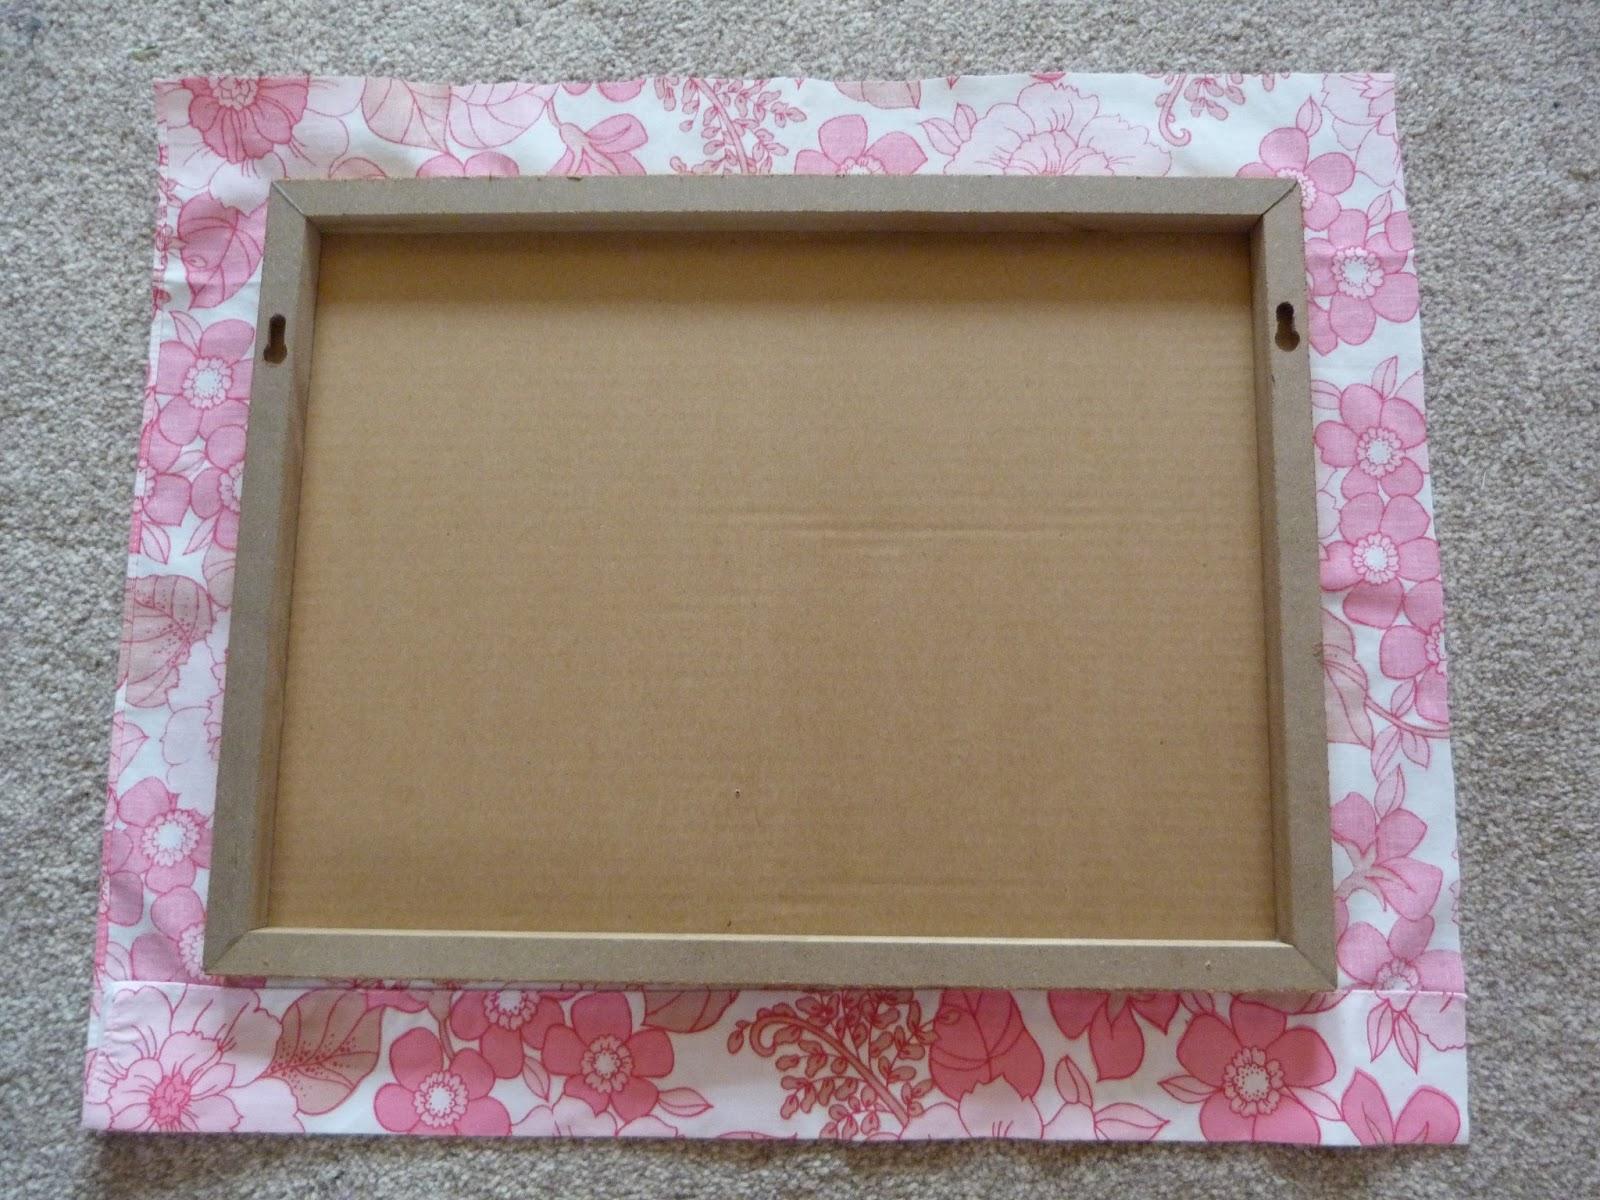 how to cut 1 2 inch cork board